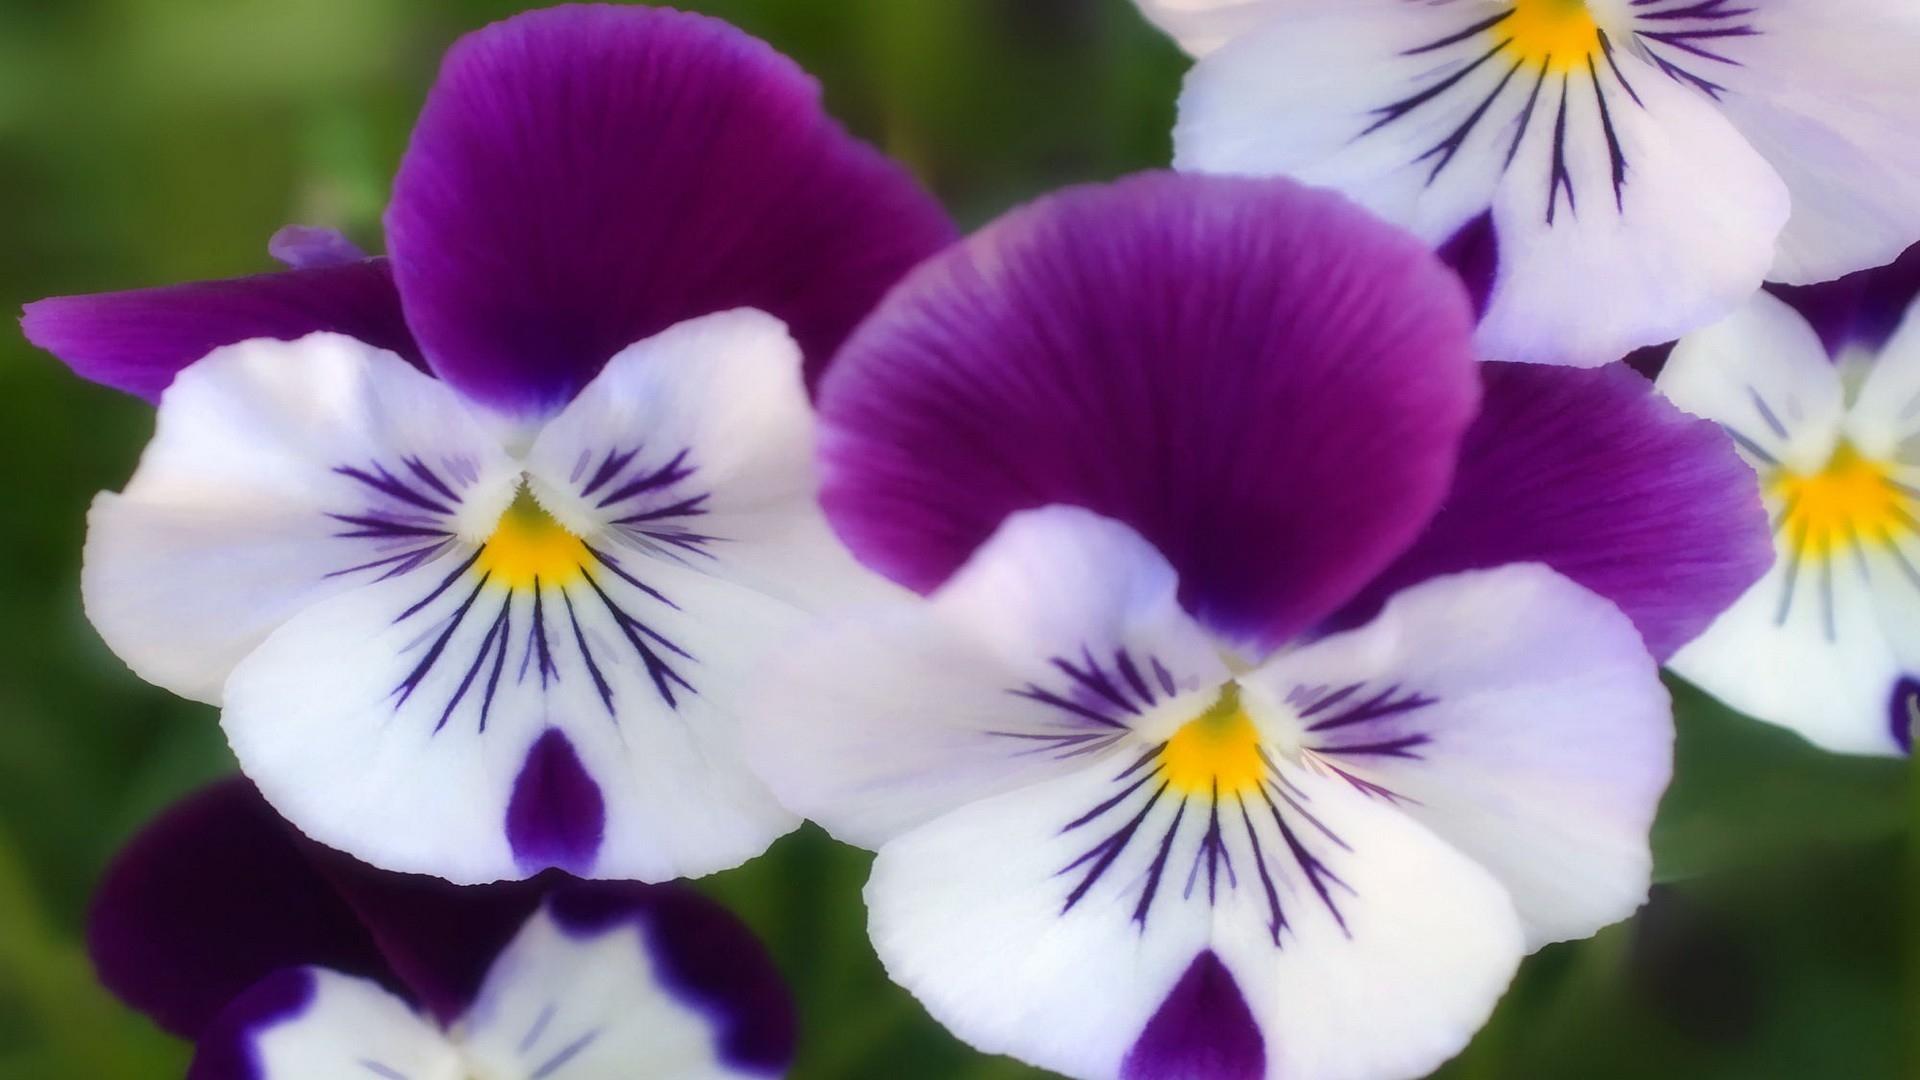 Purple white flowers